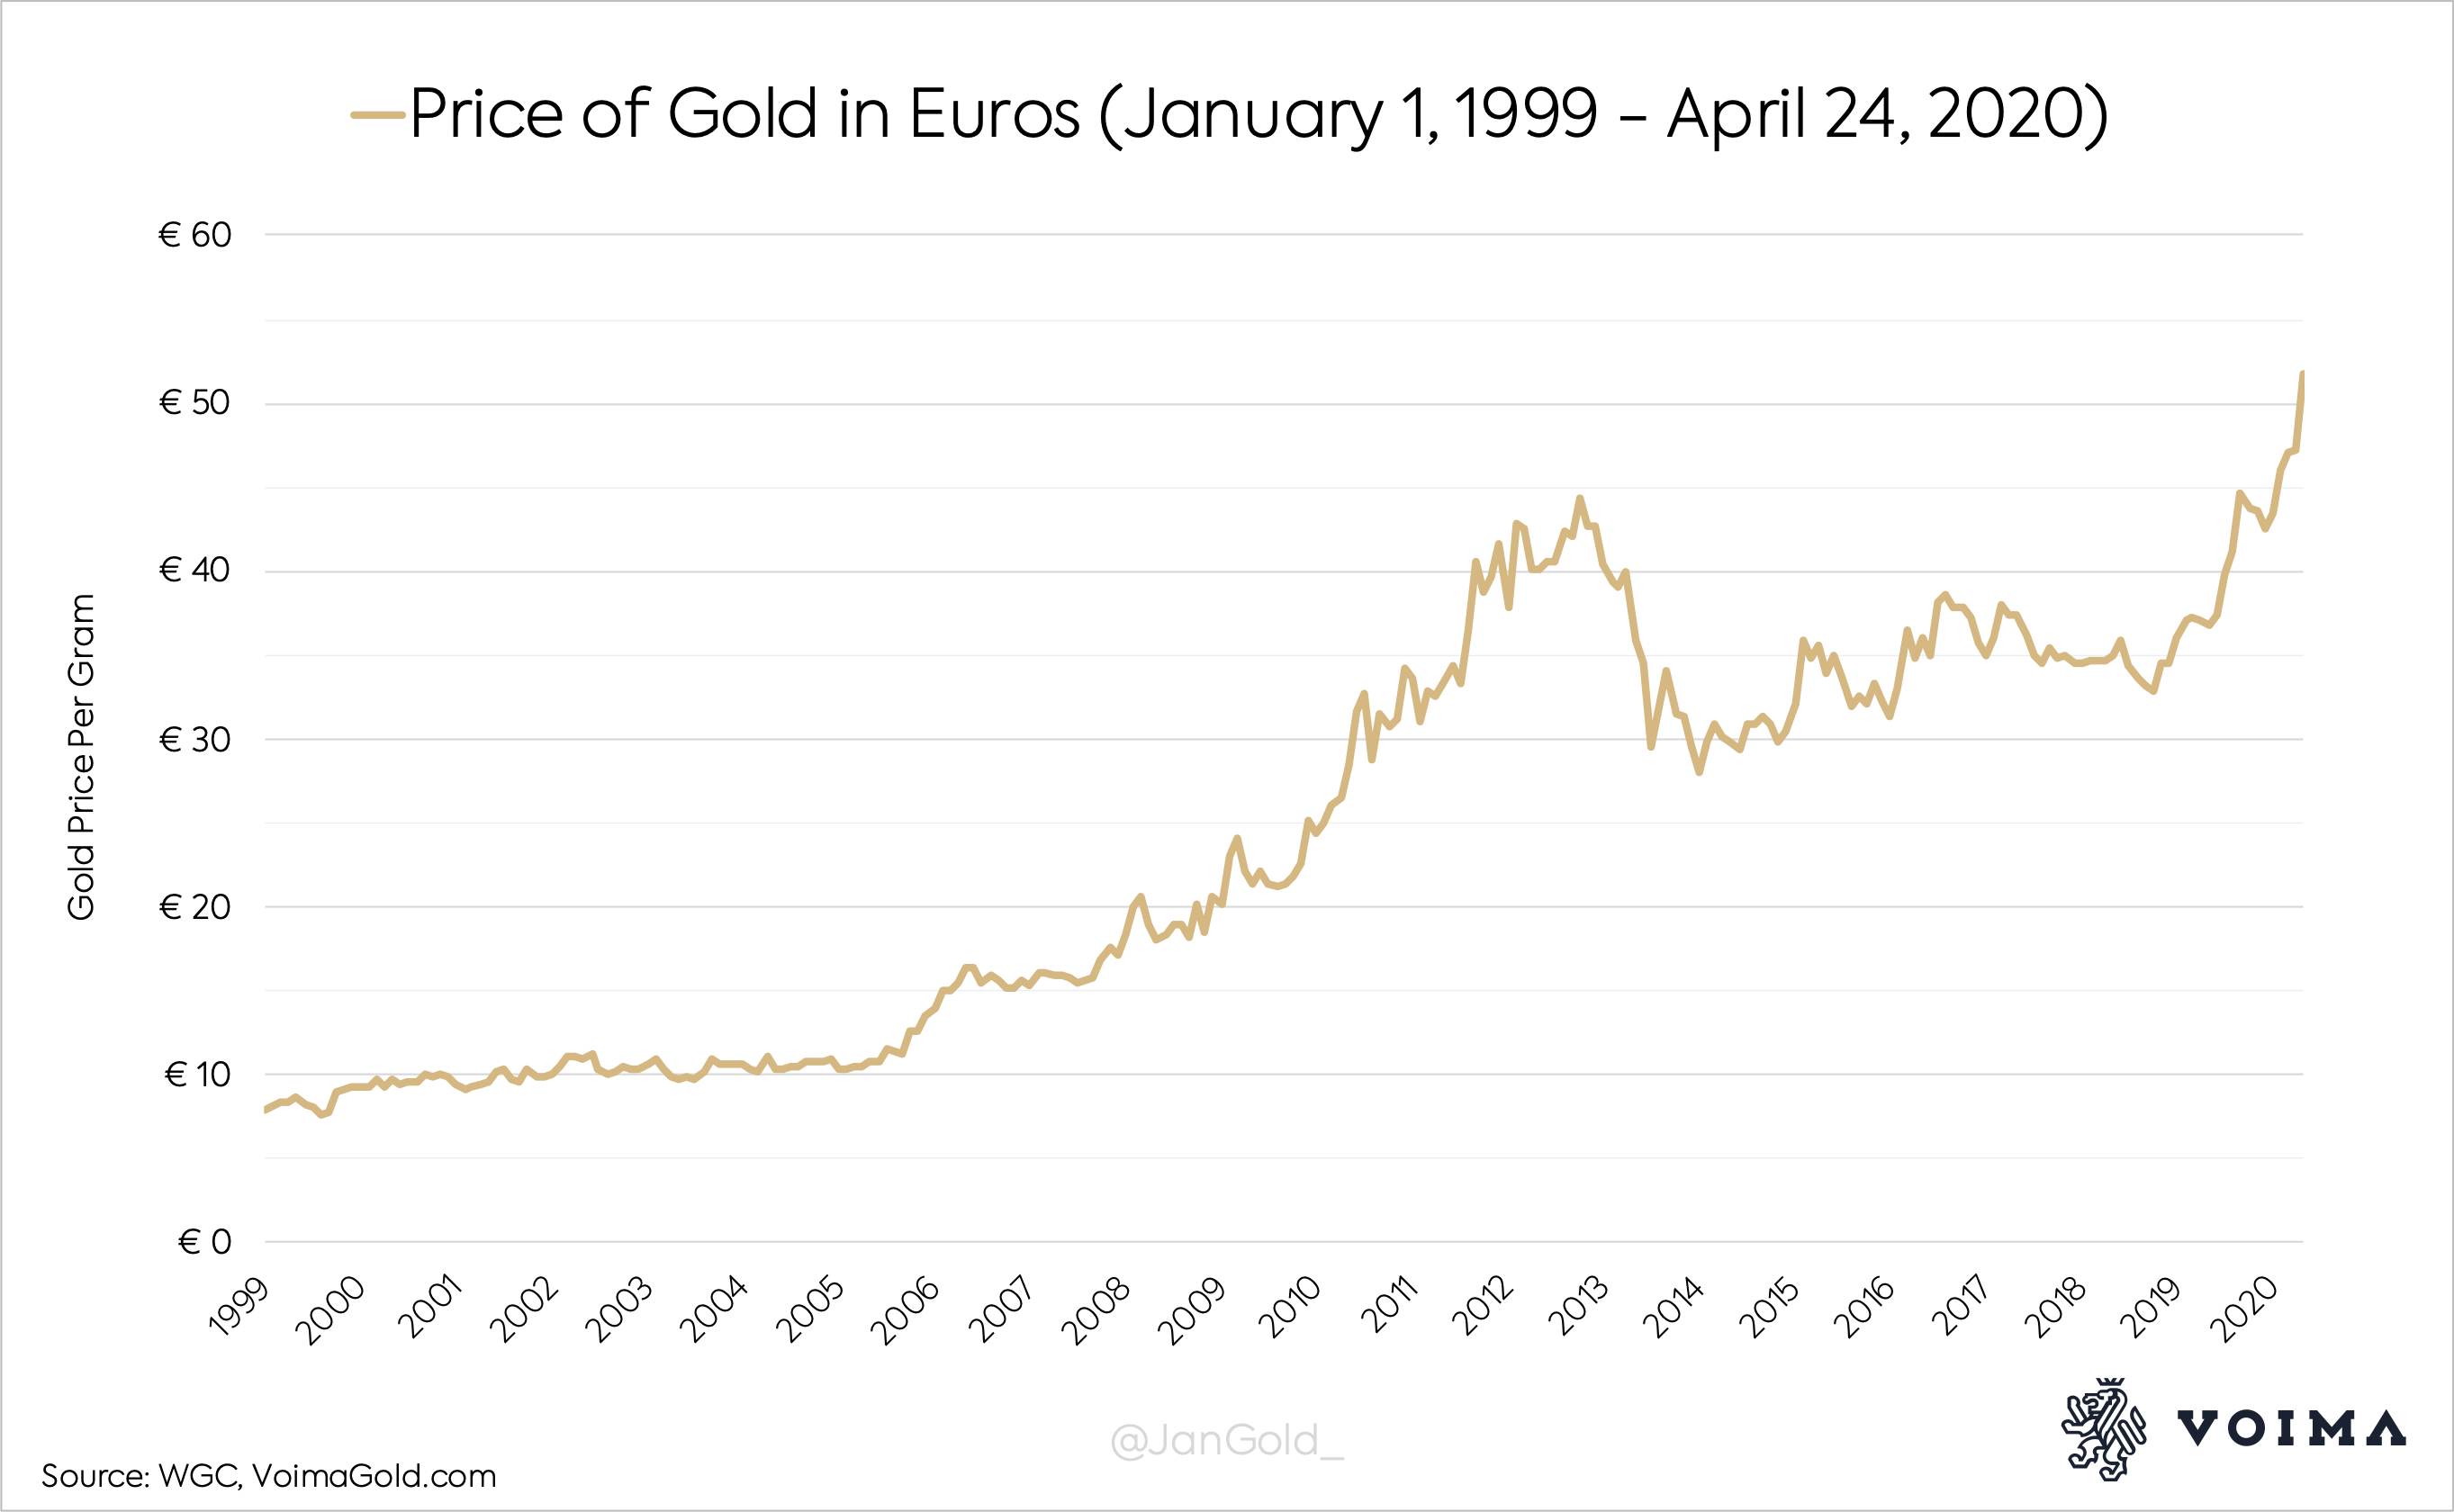 Kulla grammi hind eurodes 1999-2020 perioodil